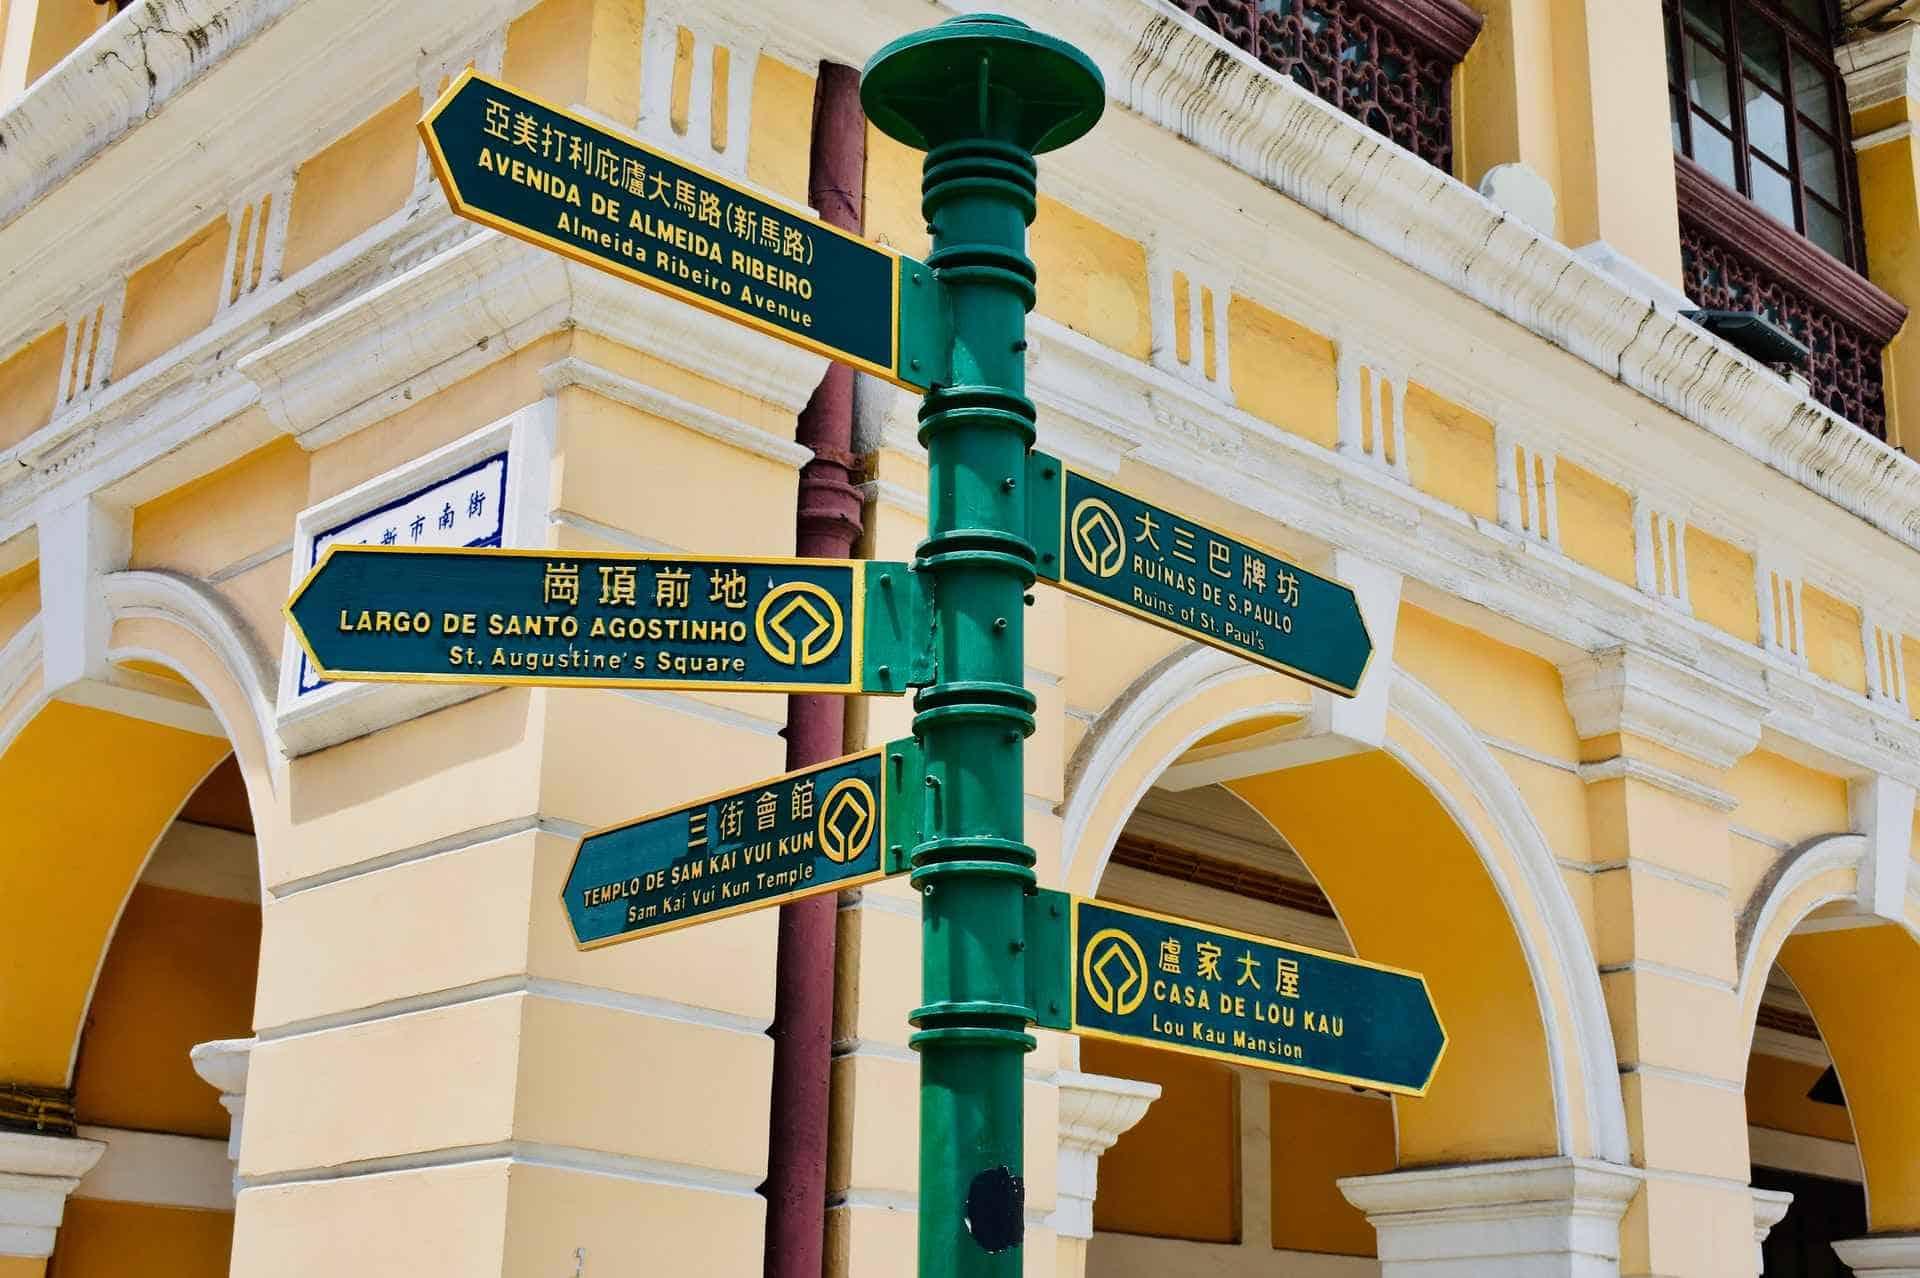 Walk through the most legendary streets of Macau